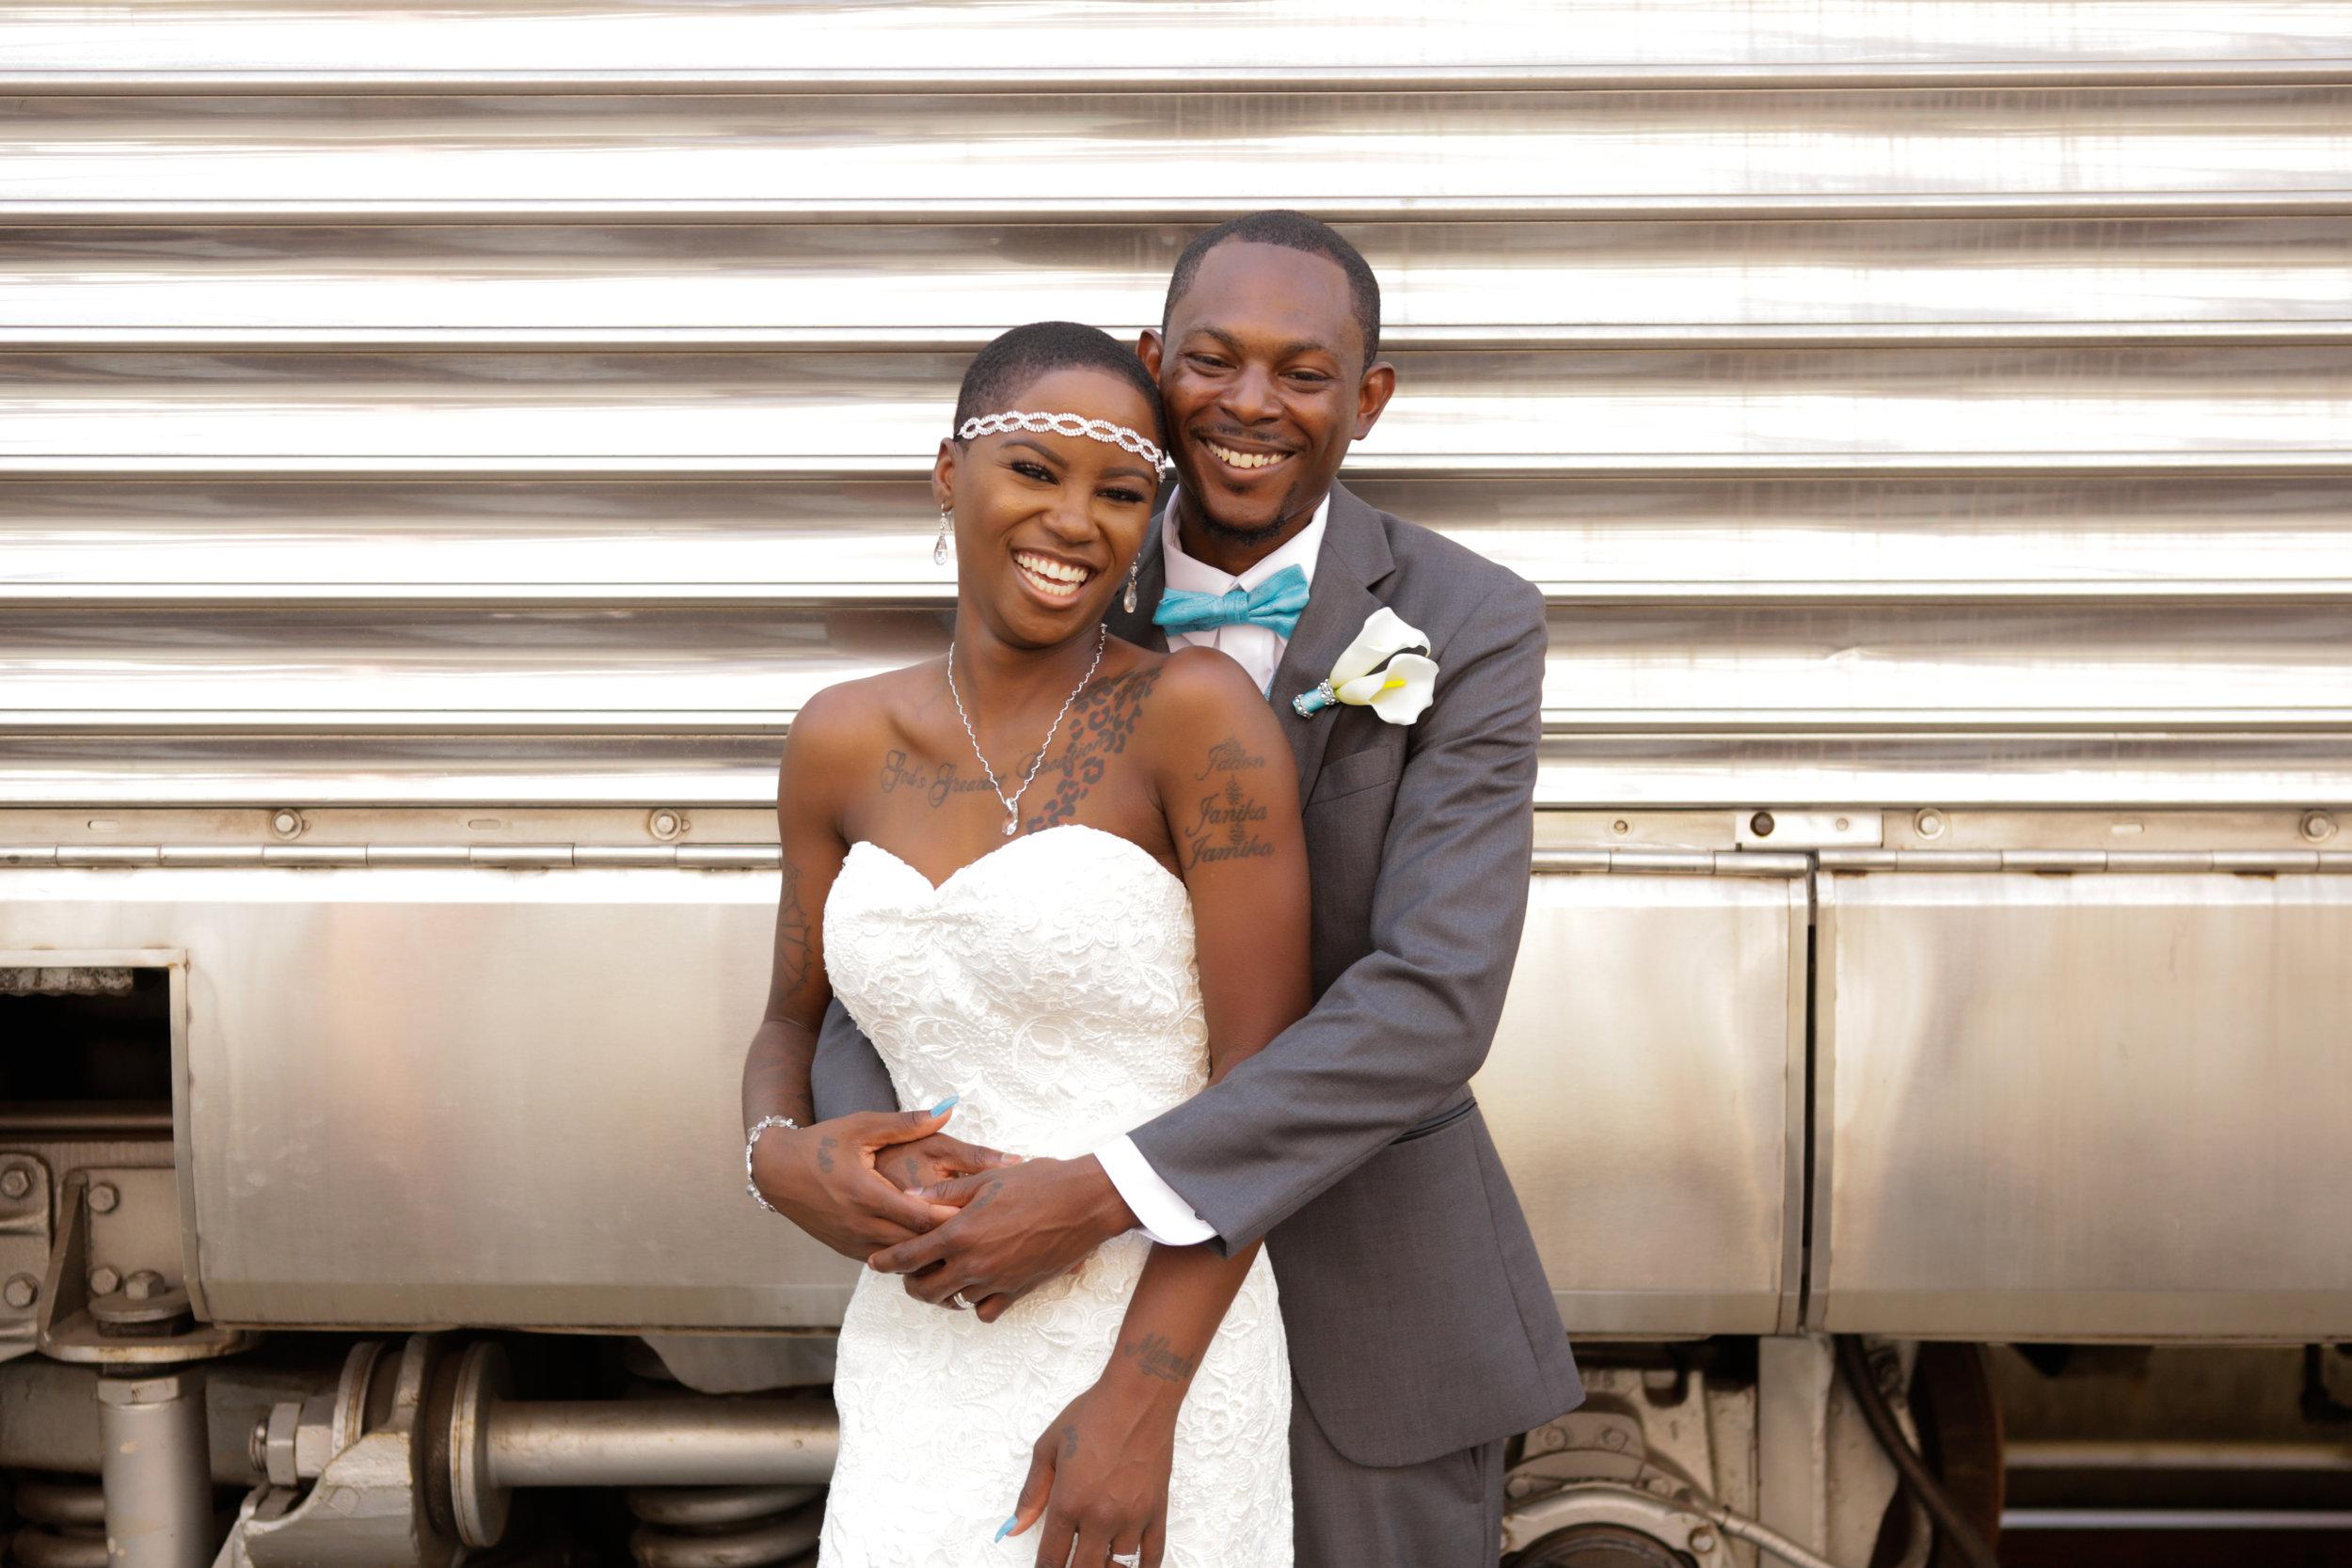 St. Louis Photographer St. Charles Photographer Engagement Wedding Photographer (16).jpg